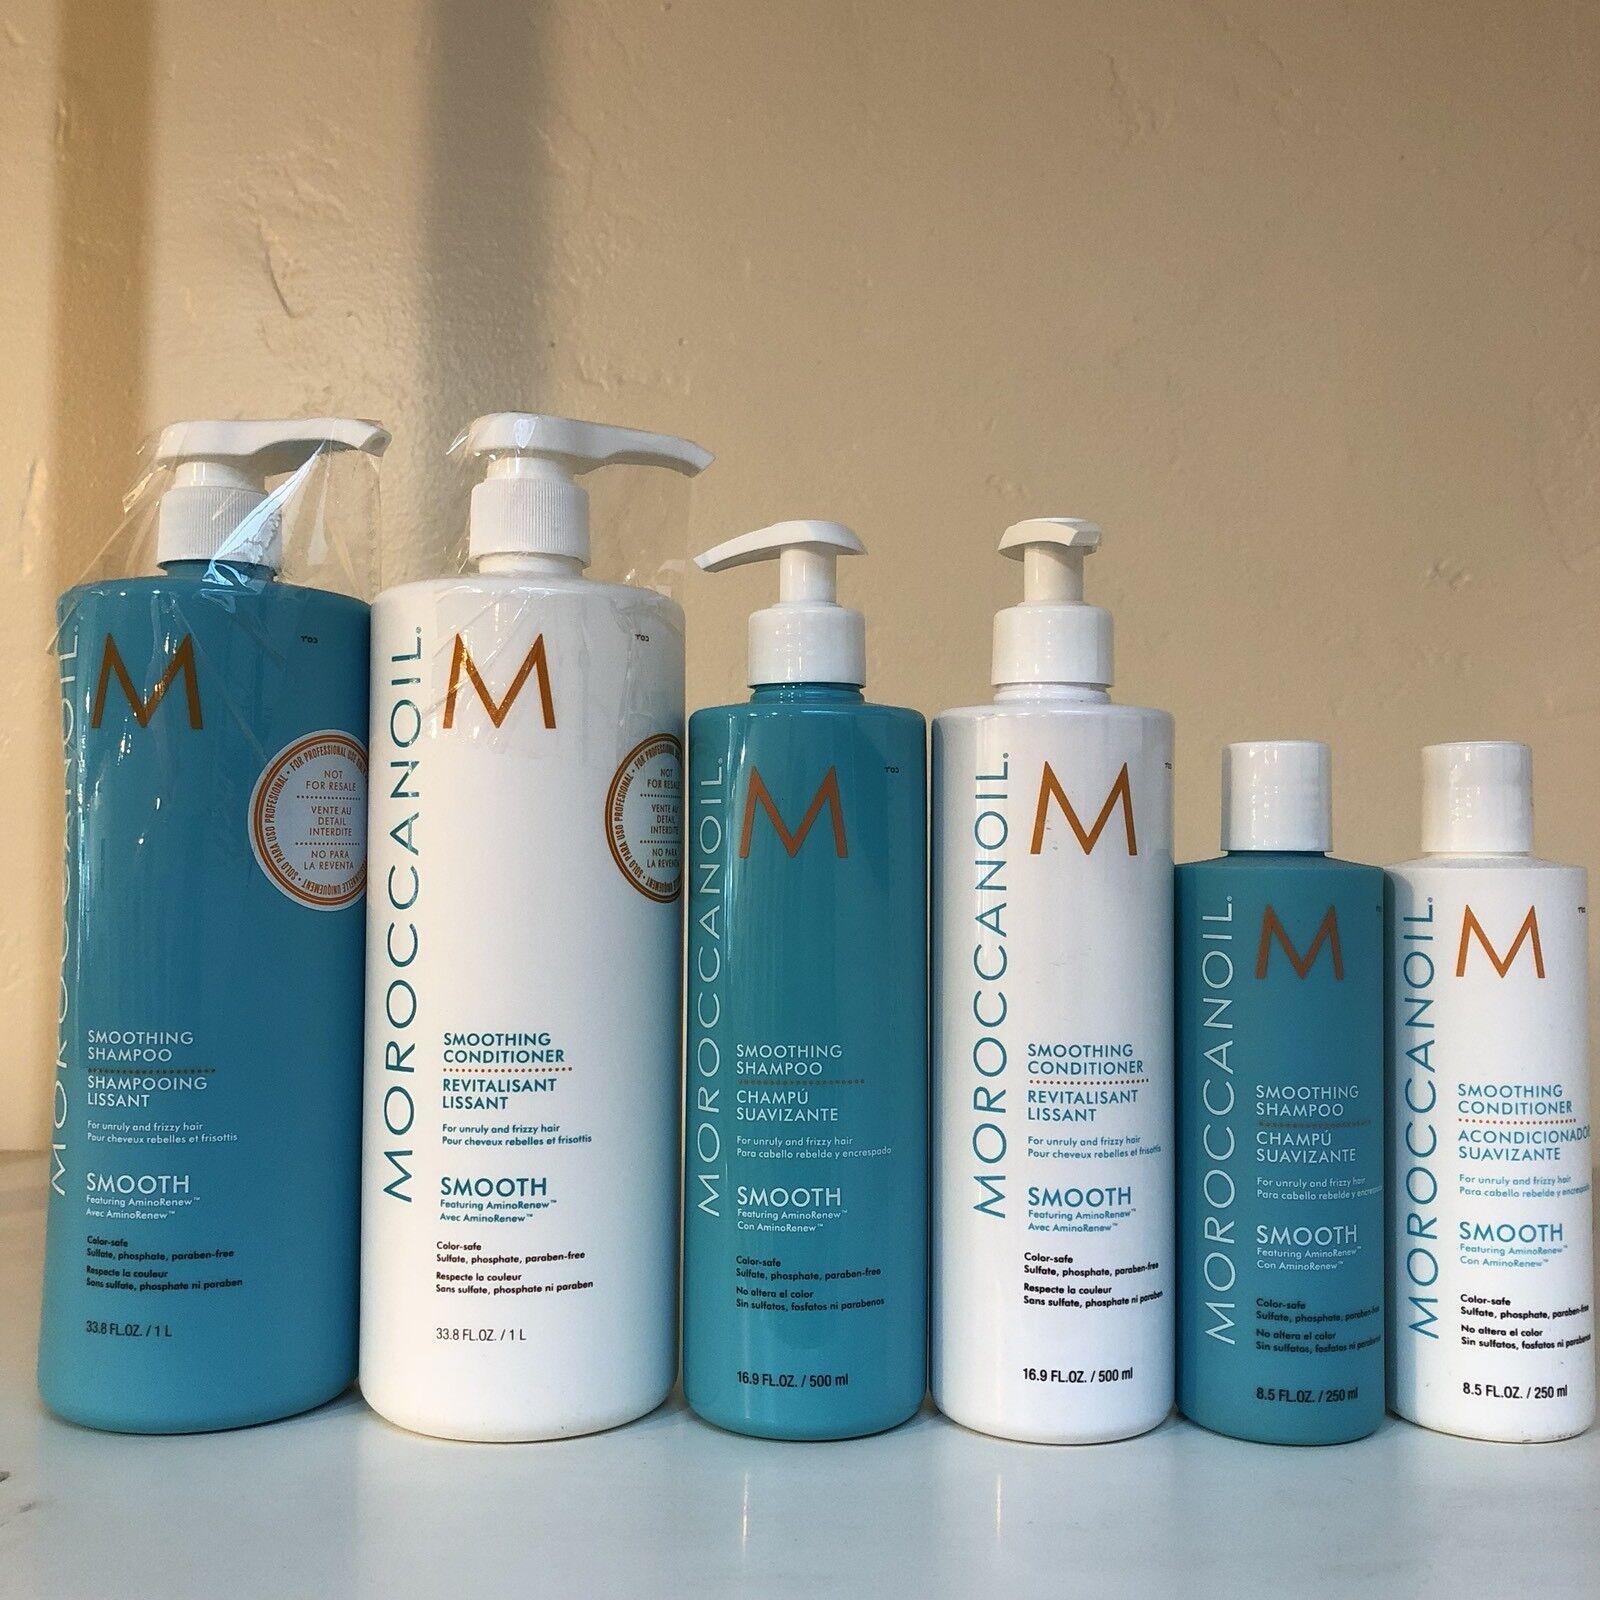 Moroccanoil Smooth Shampoo Conditioner Duo - 8oz, 16oz, 33.8